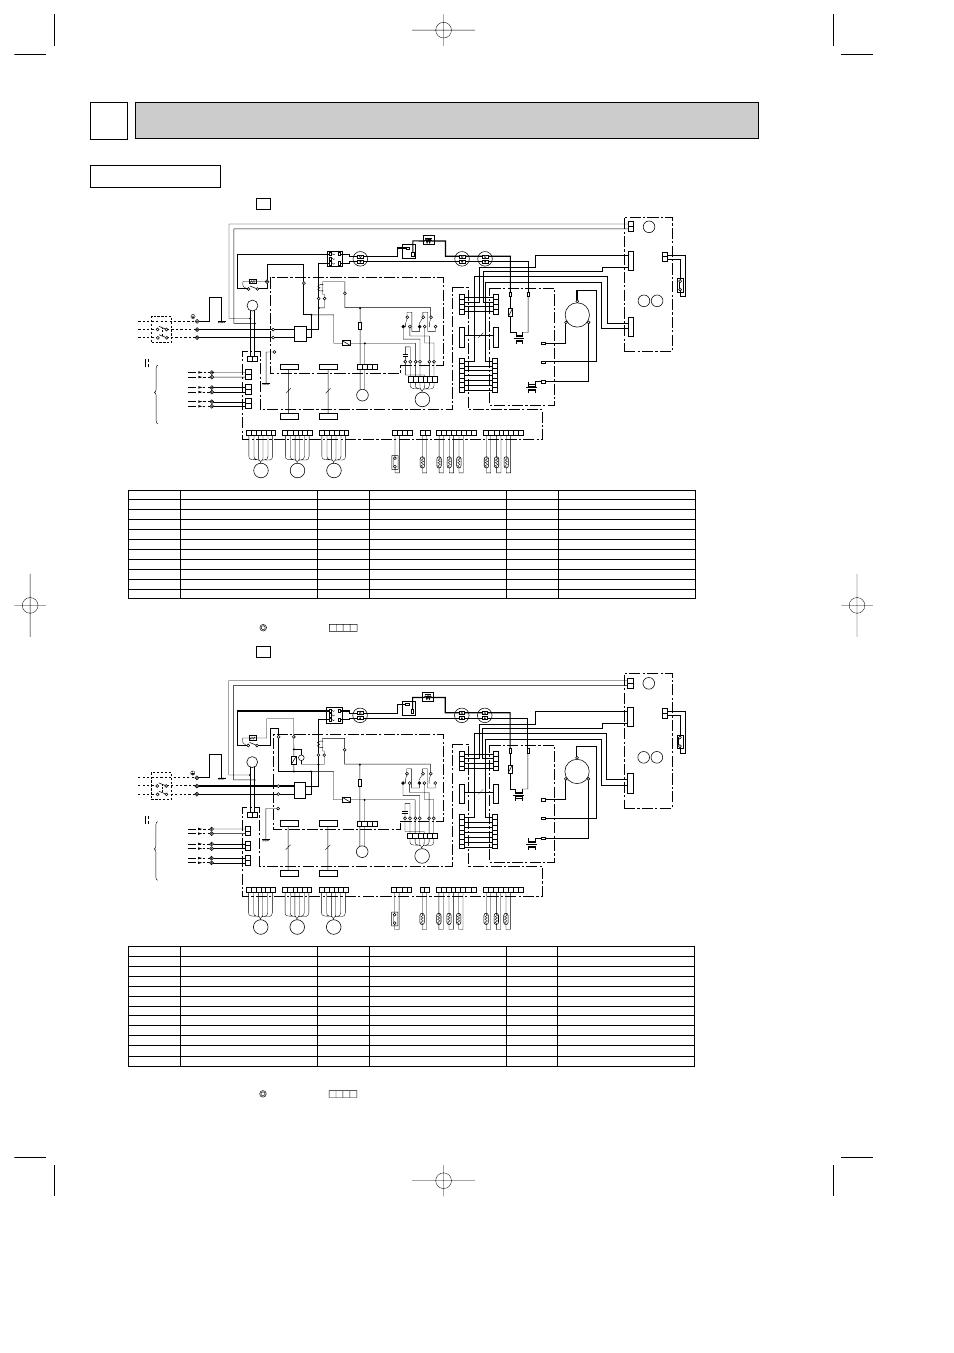 hight resolution of wiring diagram 8 models mxz 24uv outdoor unit mitsubishi electric mxz